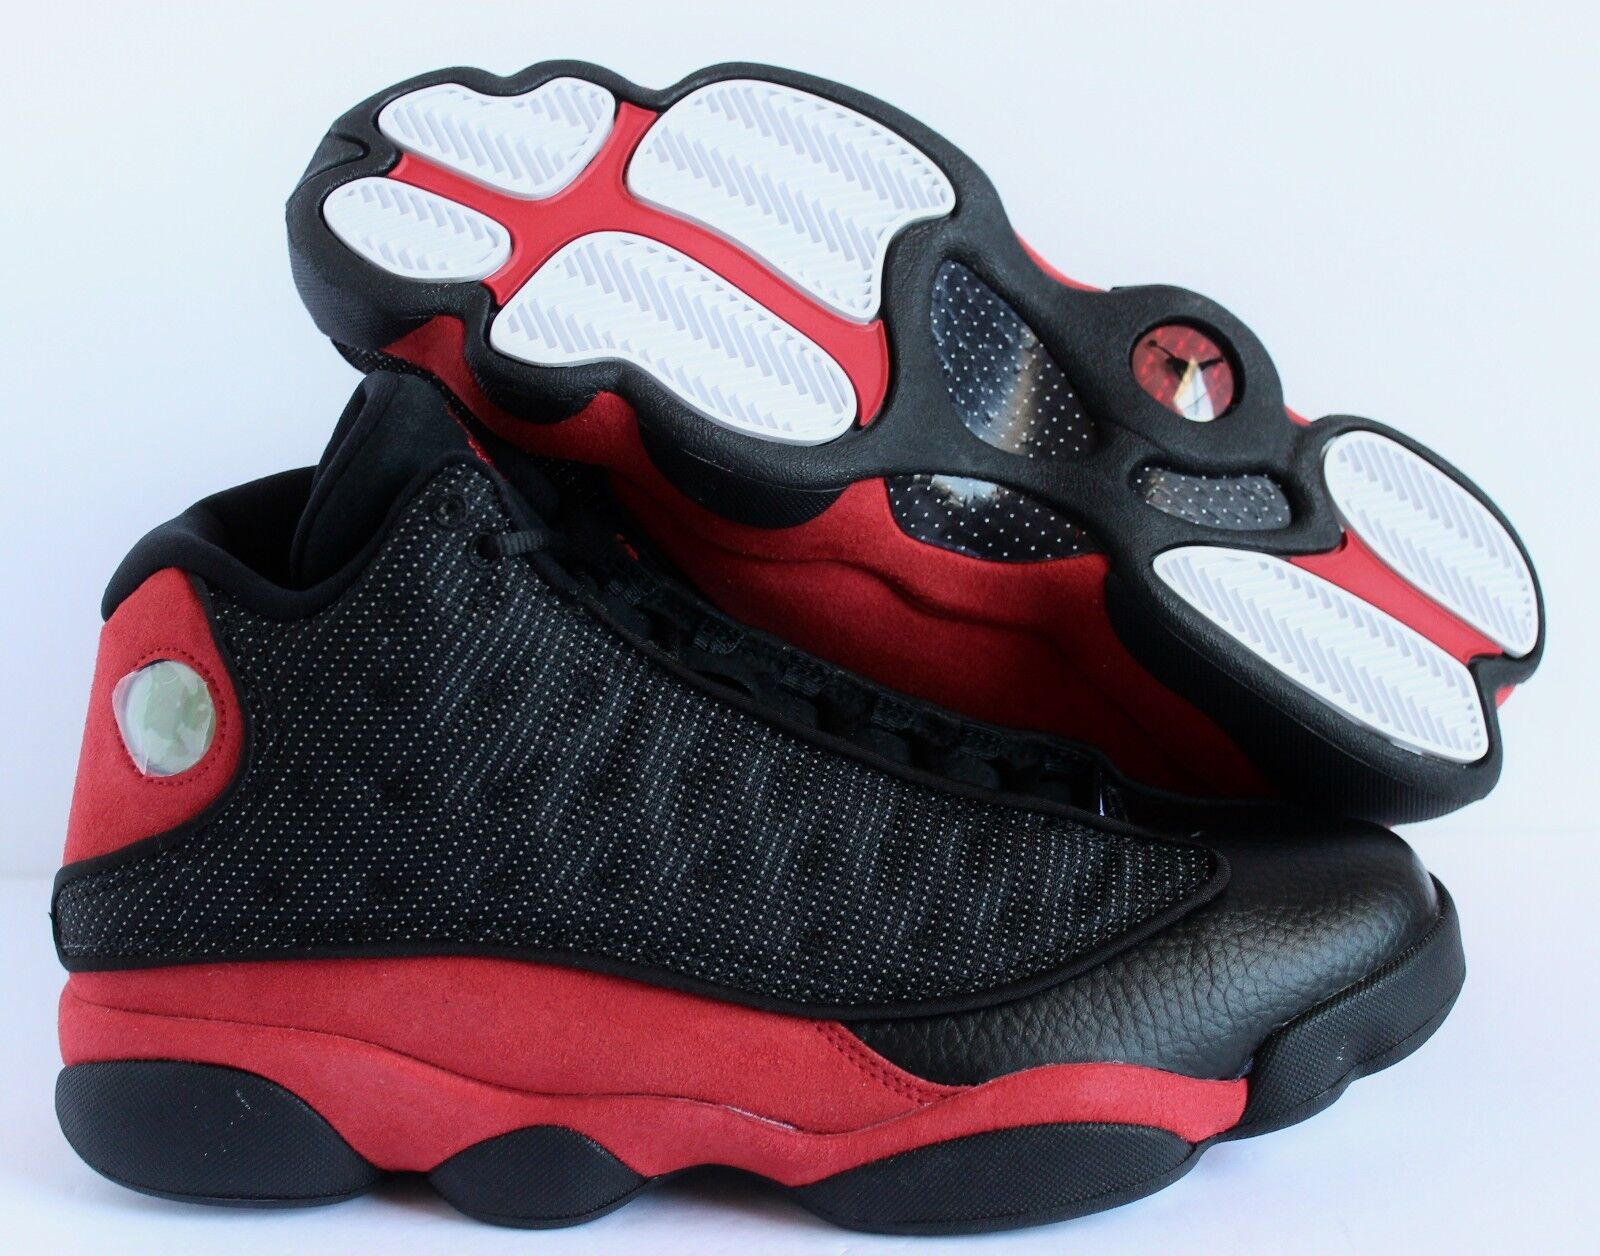 Nike Air Jordan 13 Retro Black True Red